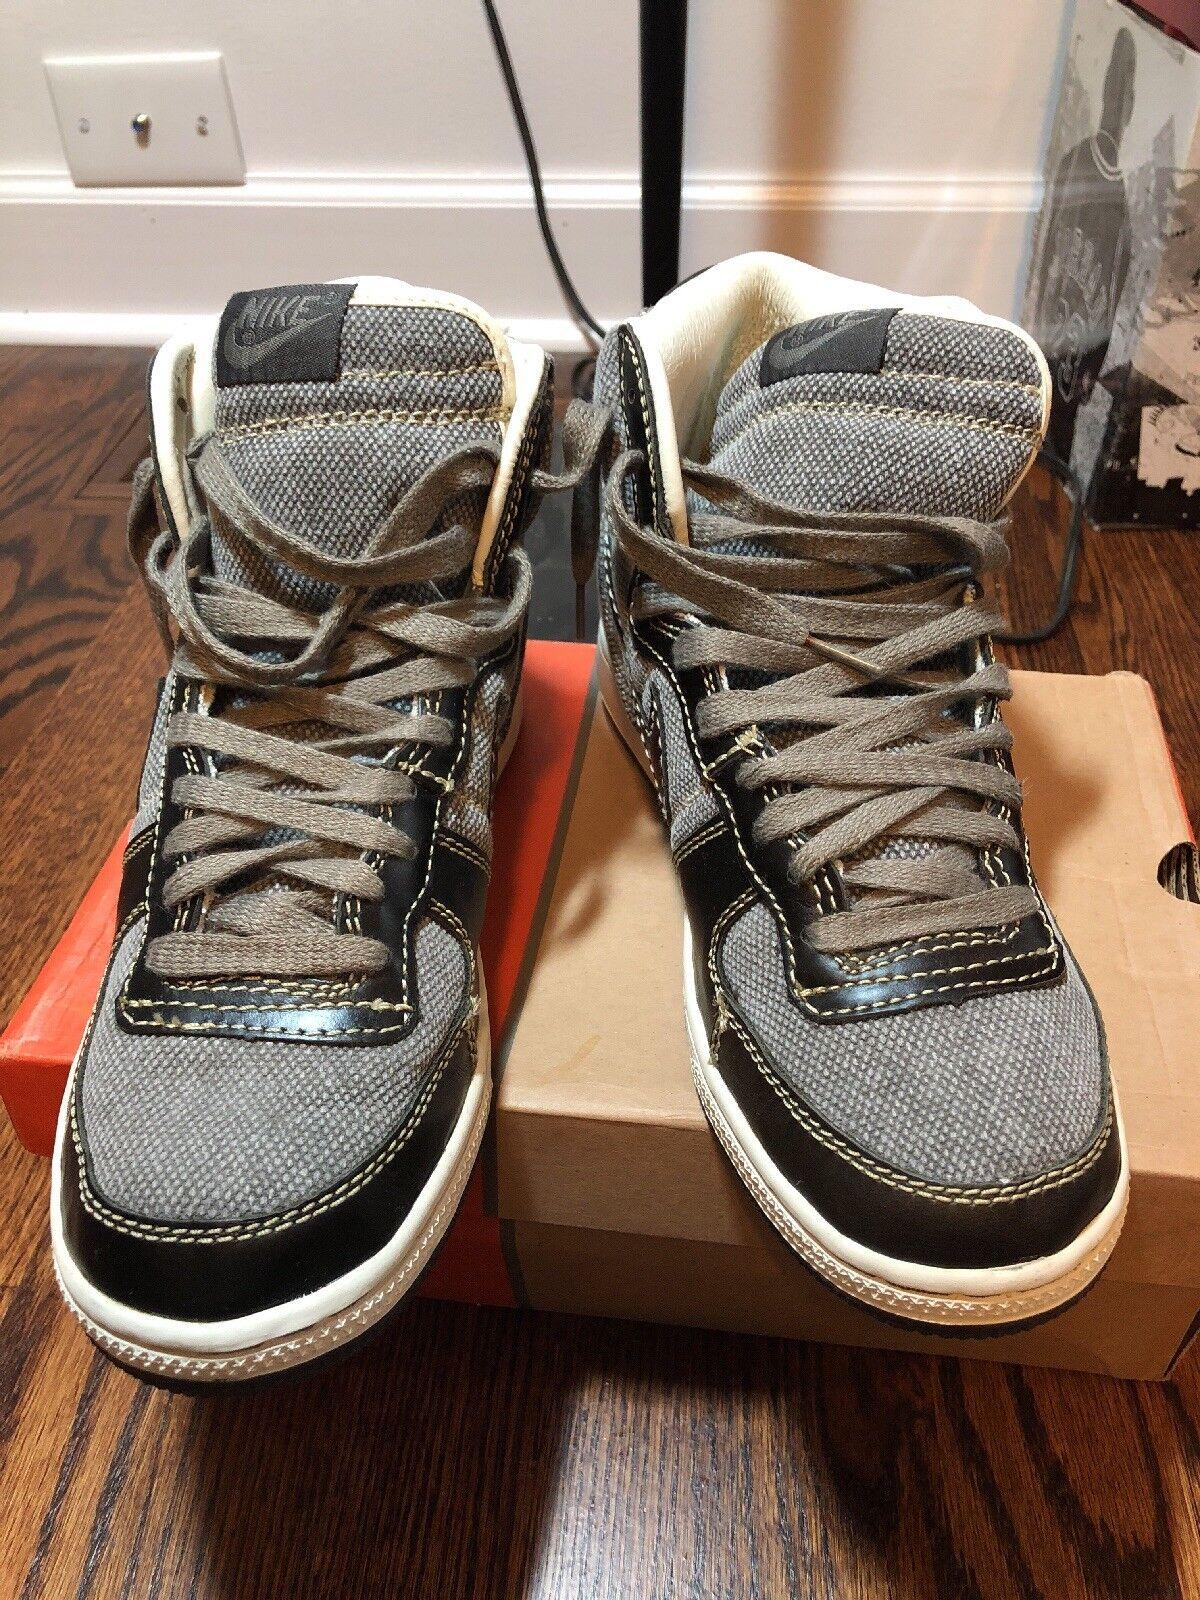 Nike Terminator Terminator Nike High Premium 2602c7